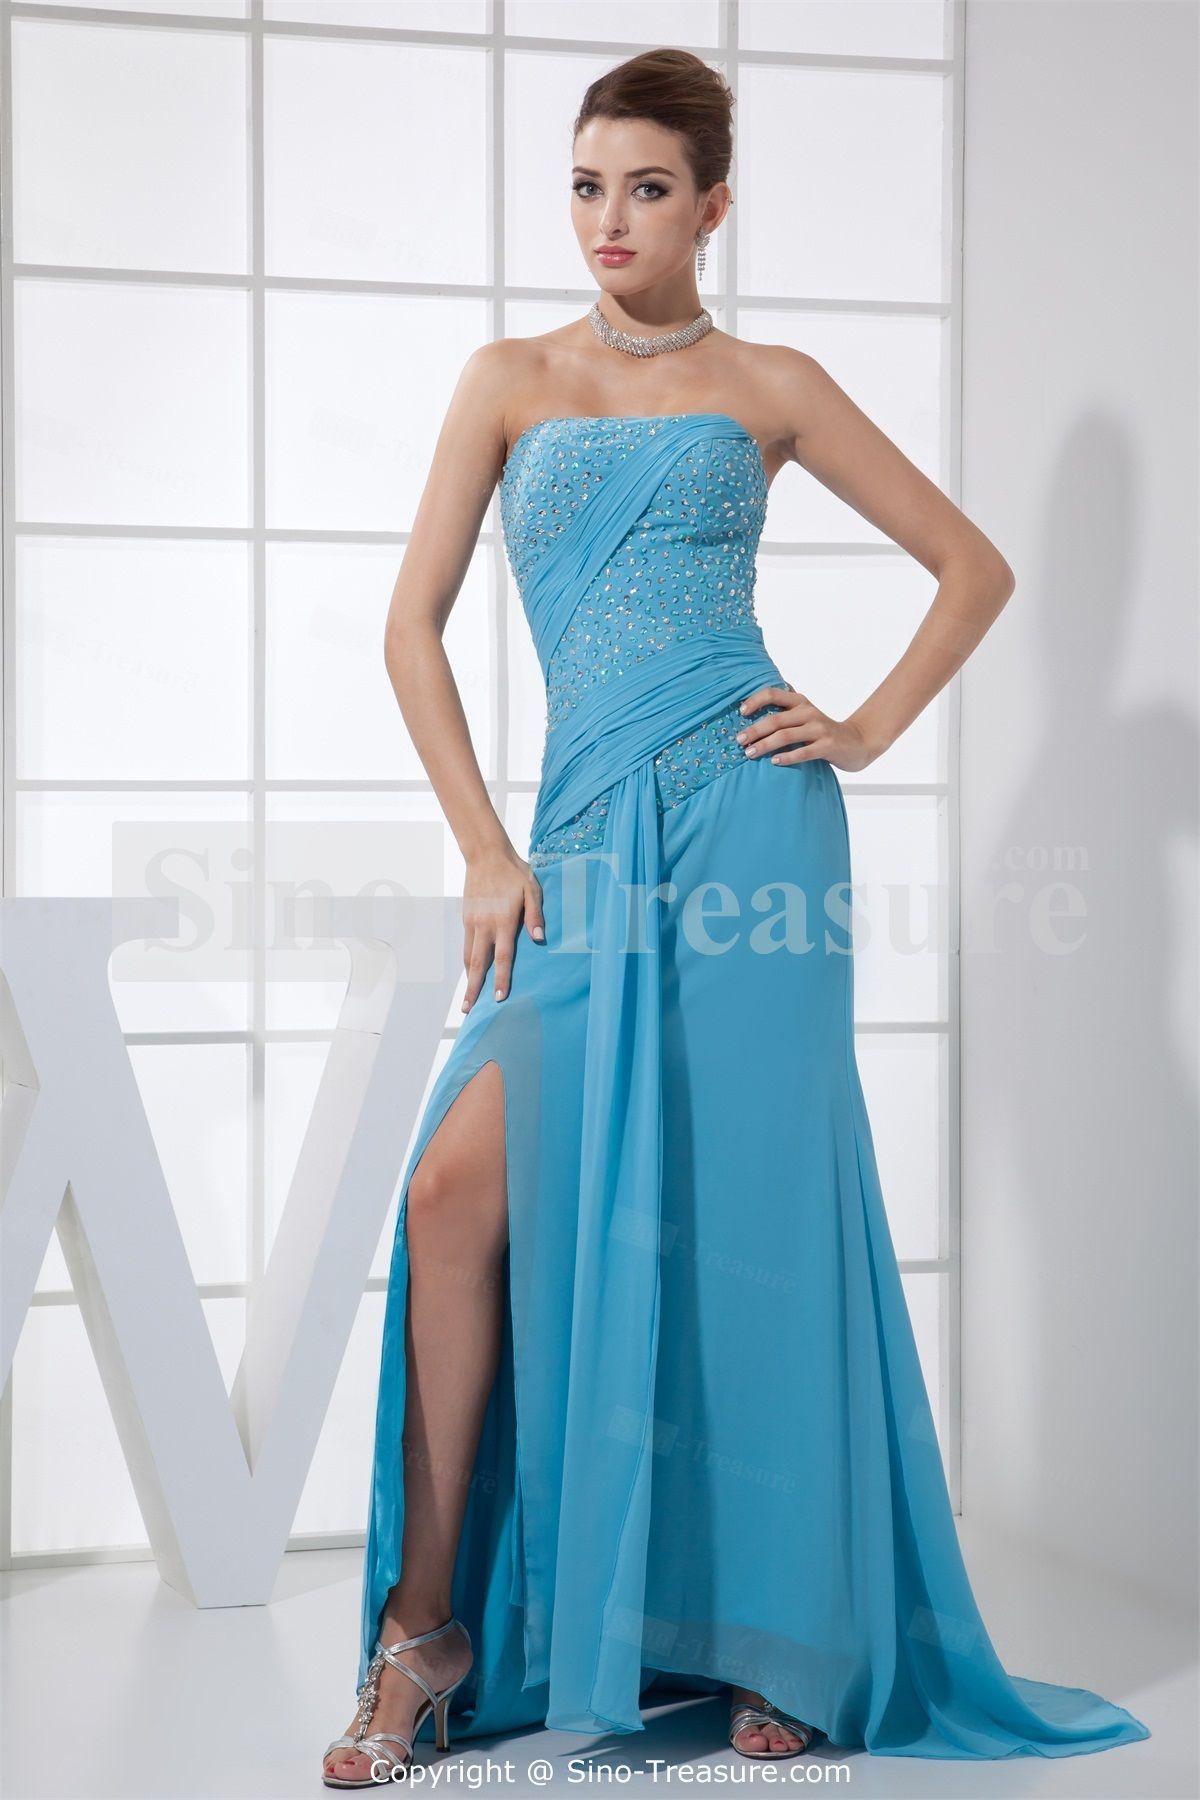 Elegant Blue Floor-Length Chiffon Strapless Petite Prom Dress ...